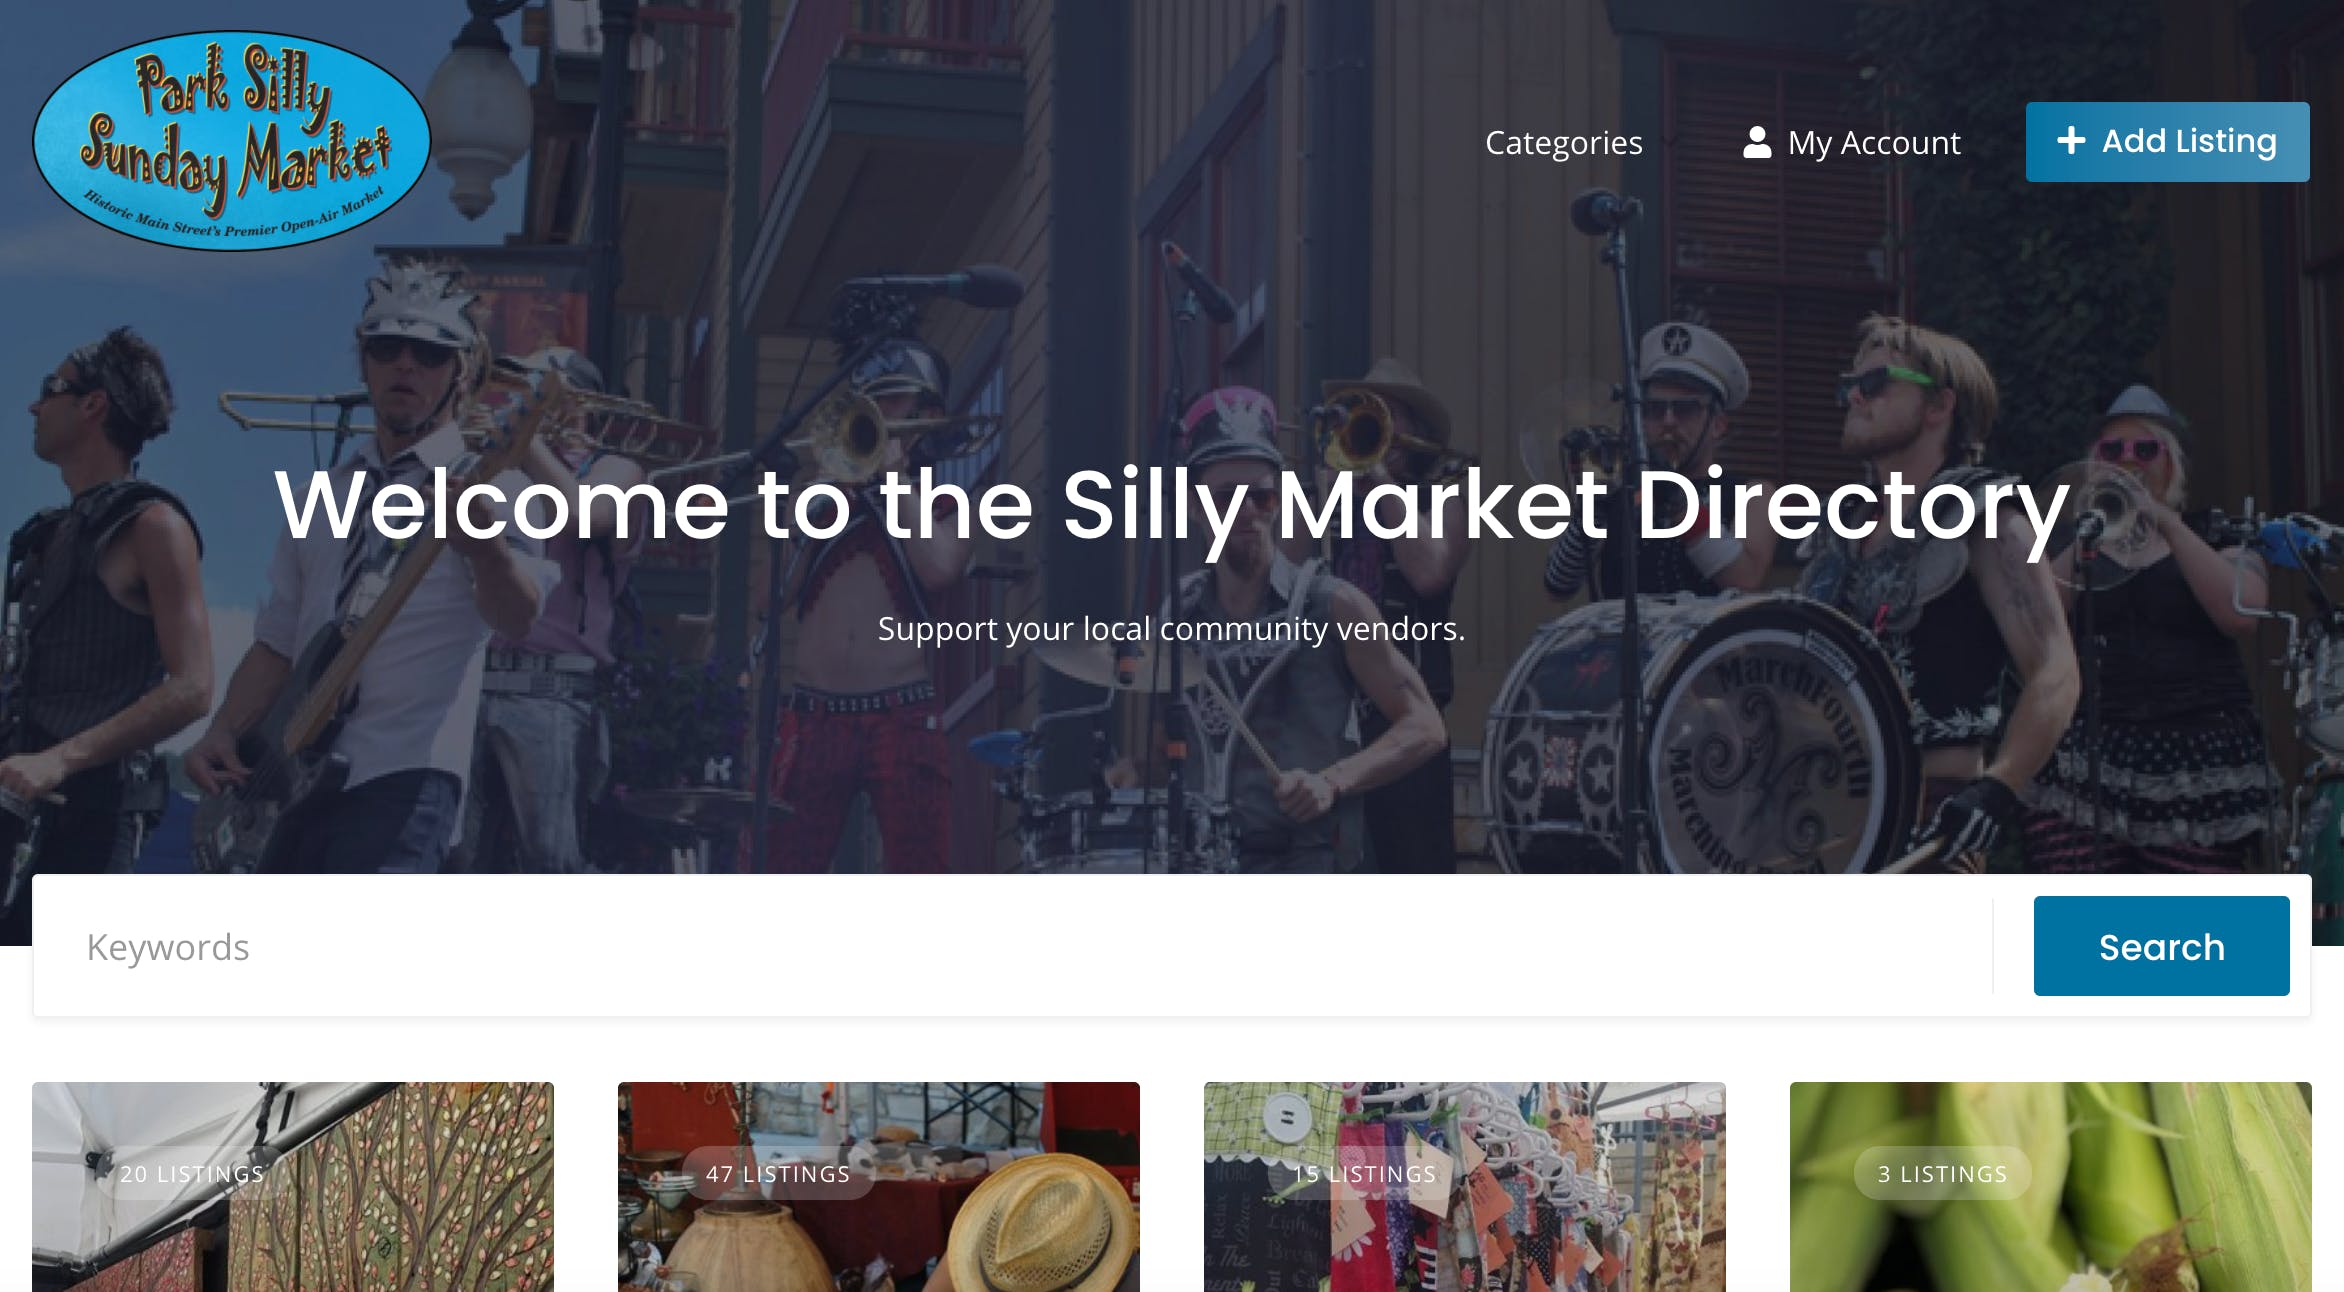 Park City Silly Market - Vendor Directory Screengrab